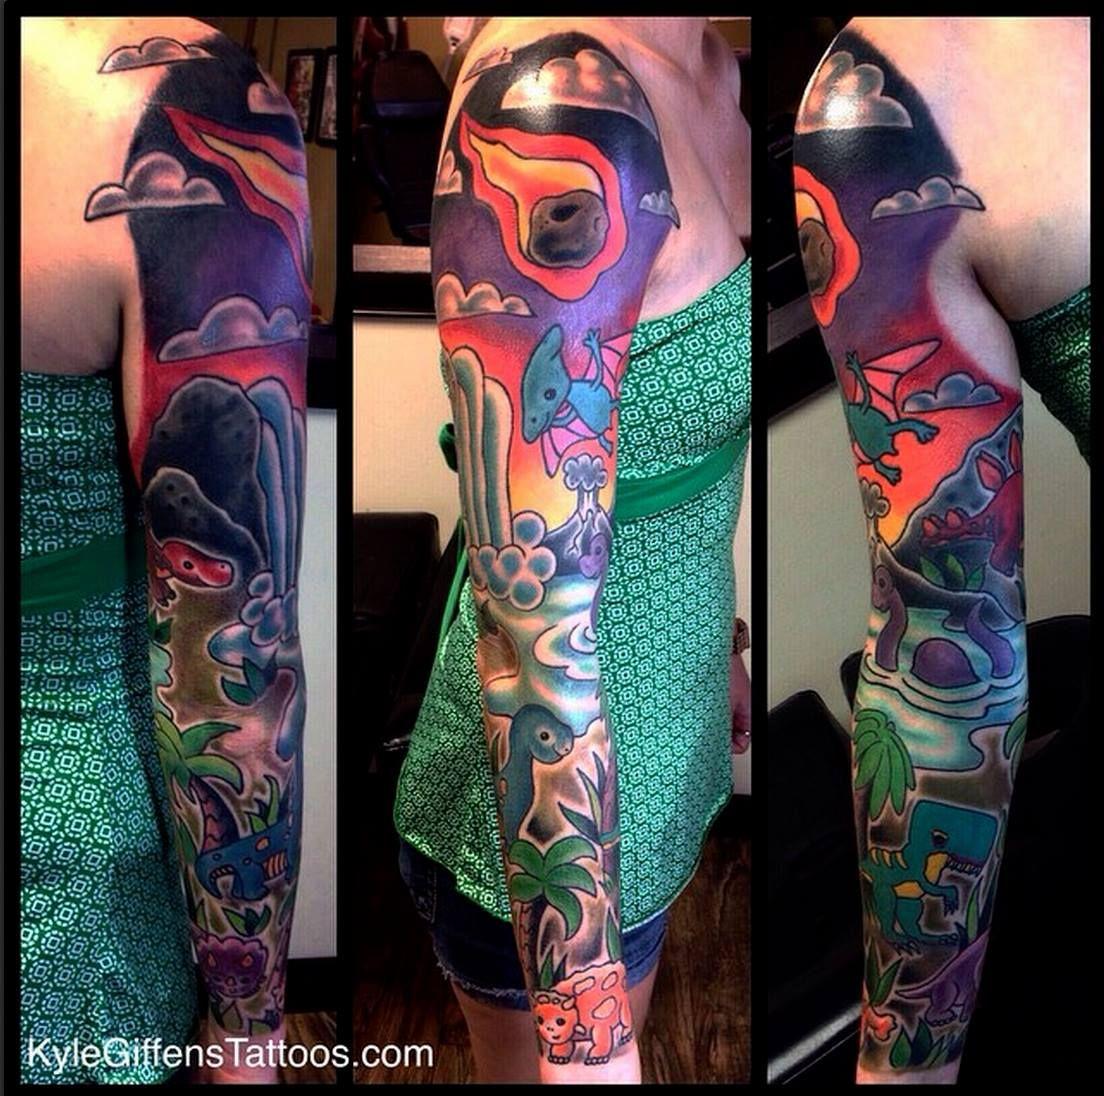 Dinosaur sleeve by Kyle Giffen in Austin TX at Little Pricks Tattoo ...